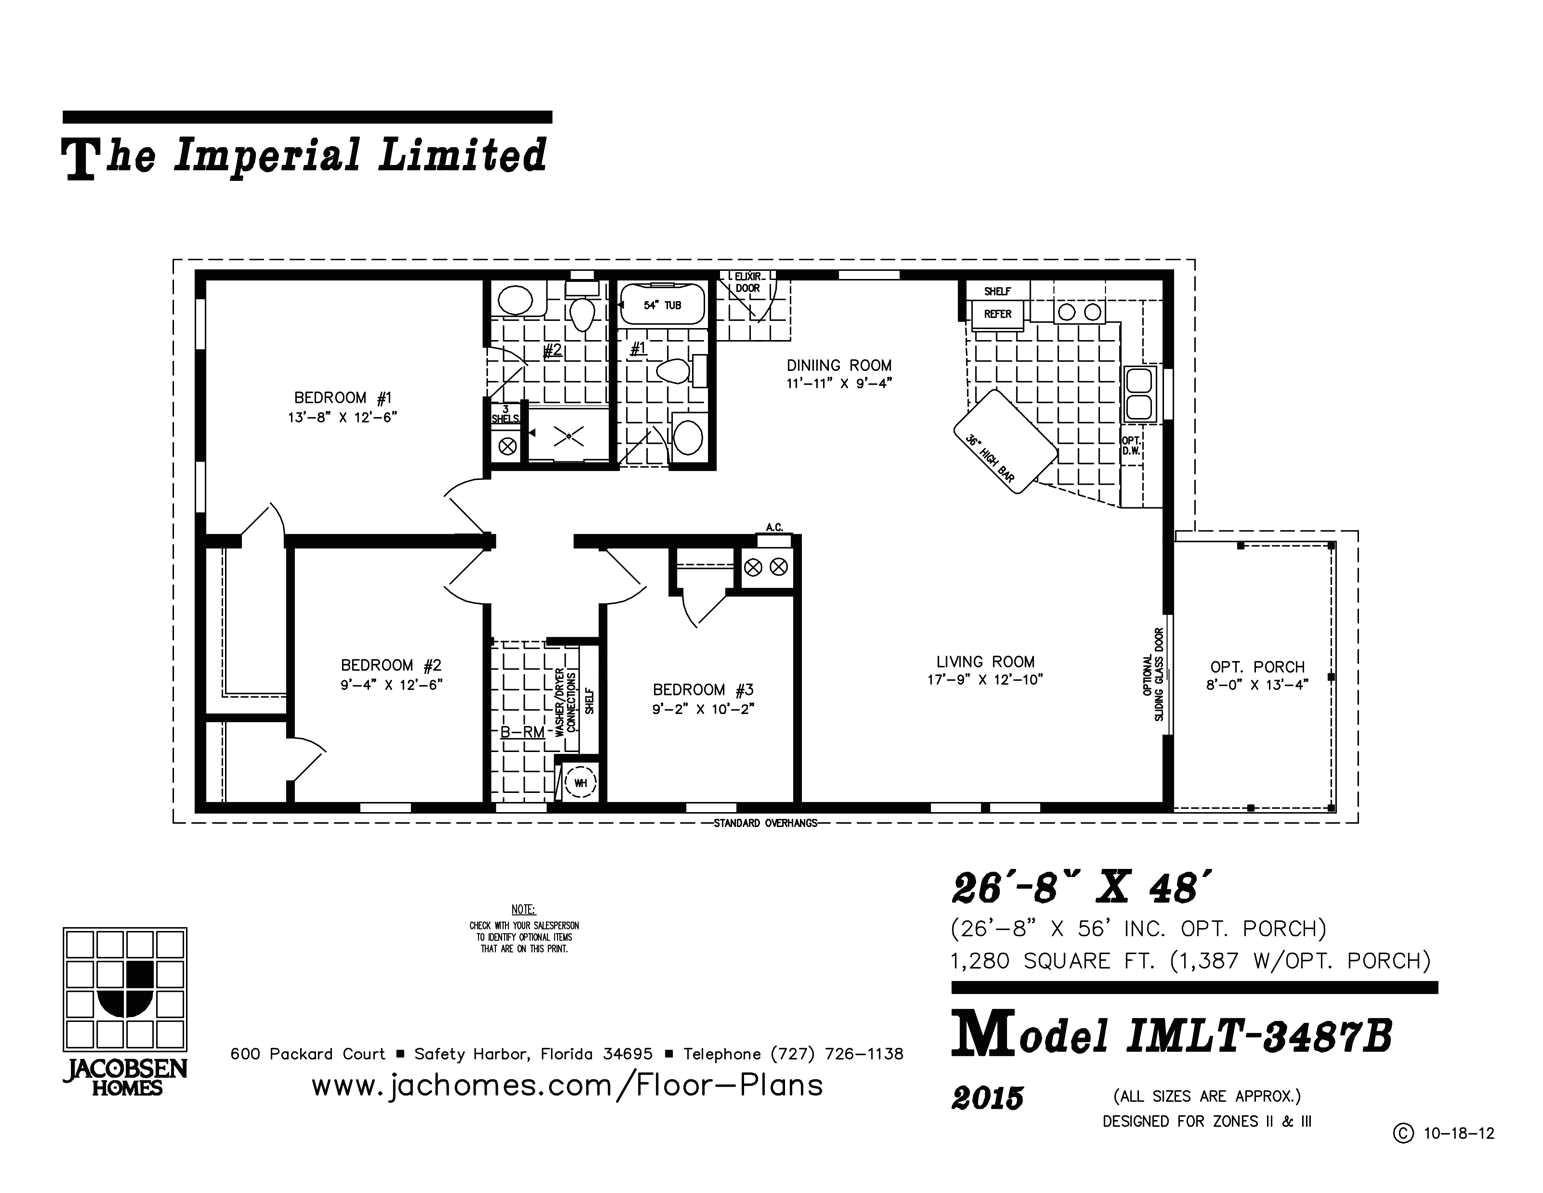 pole barn homes floor plans ryland homes floor plans build a floor plan simple house floor plans